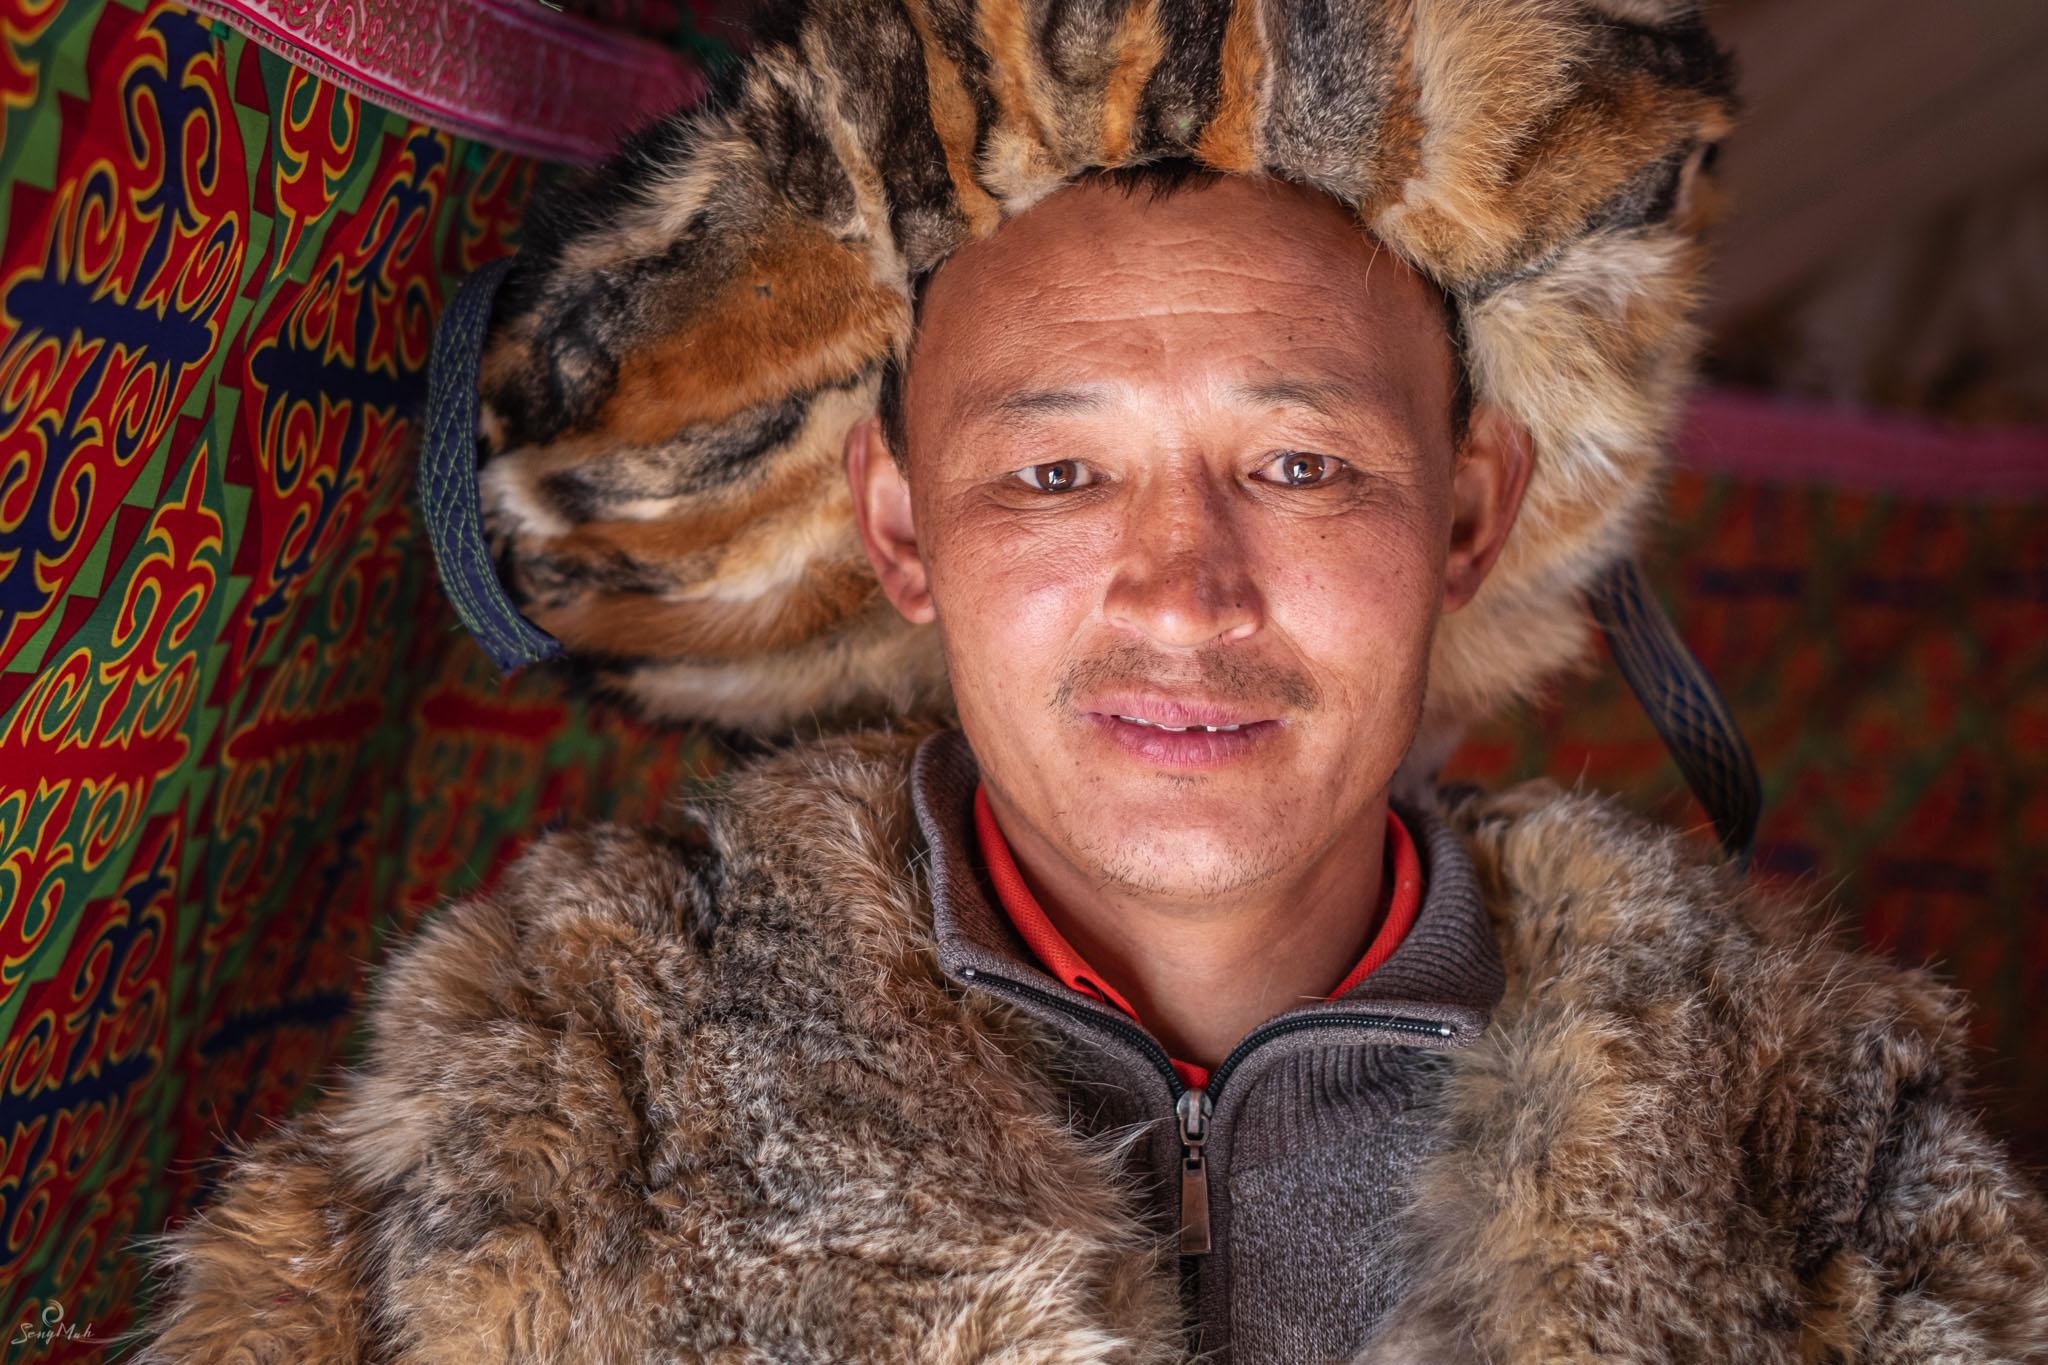 Portrait of a Kazakh man